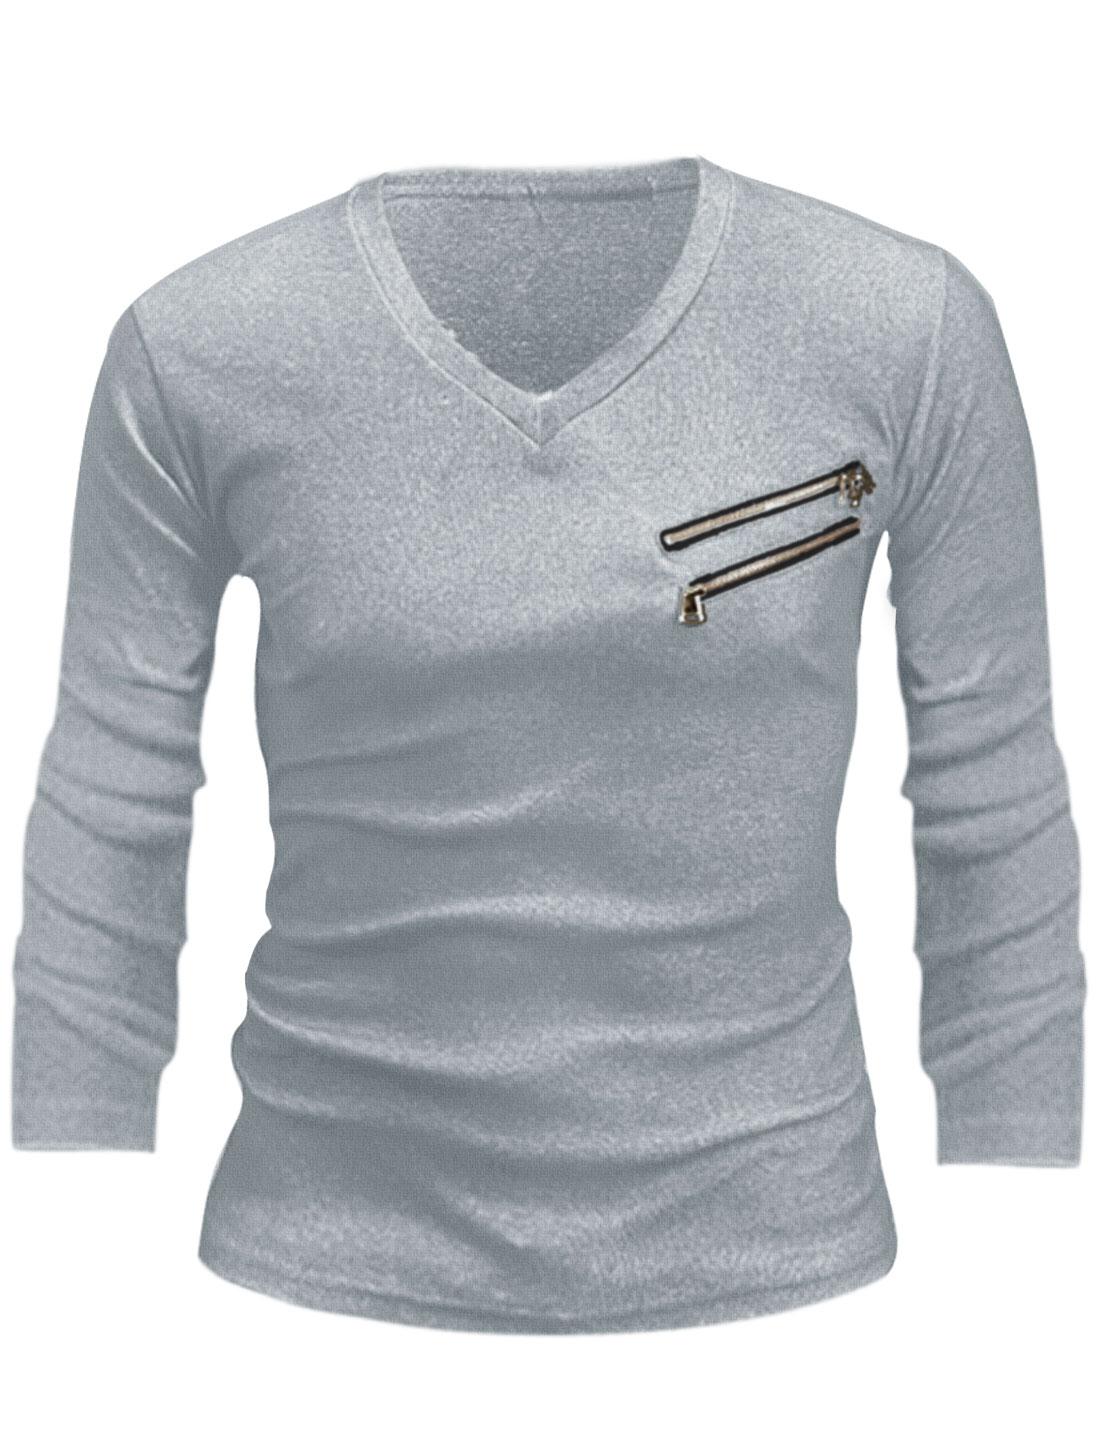 Men Pullover Long Sleeve Double Zippers Decor T-shirt Light Gray S